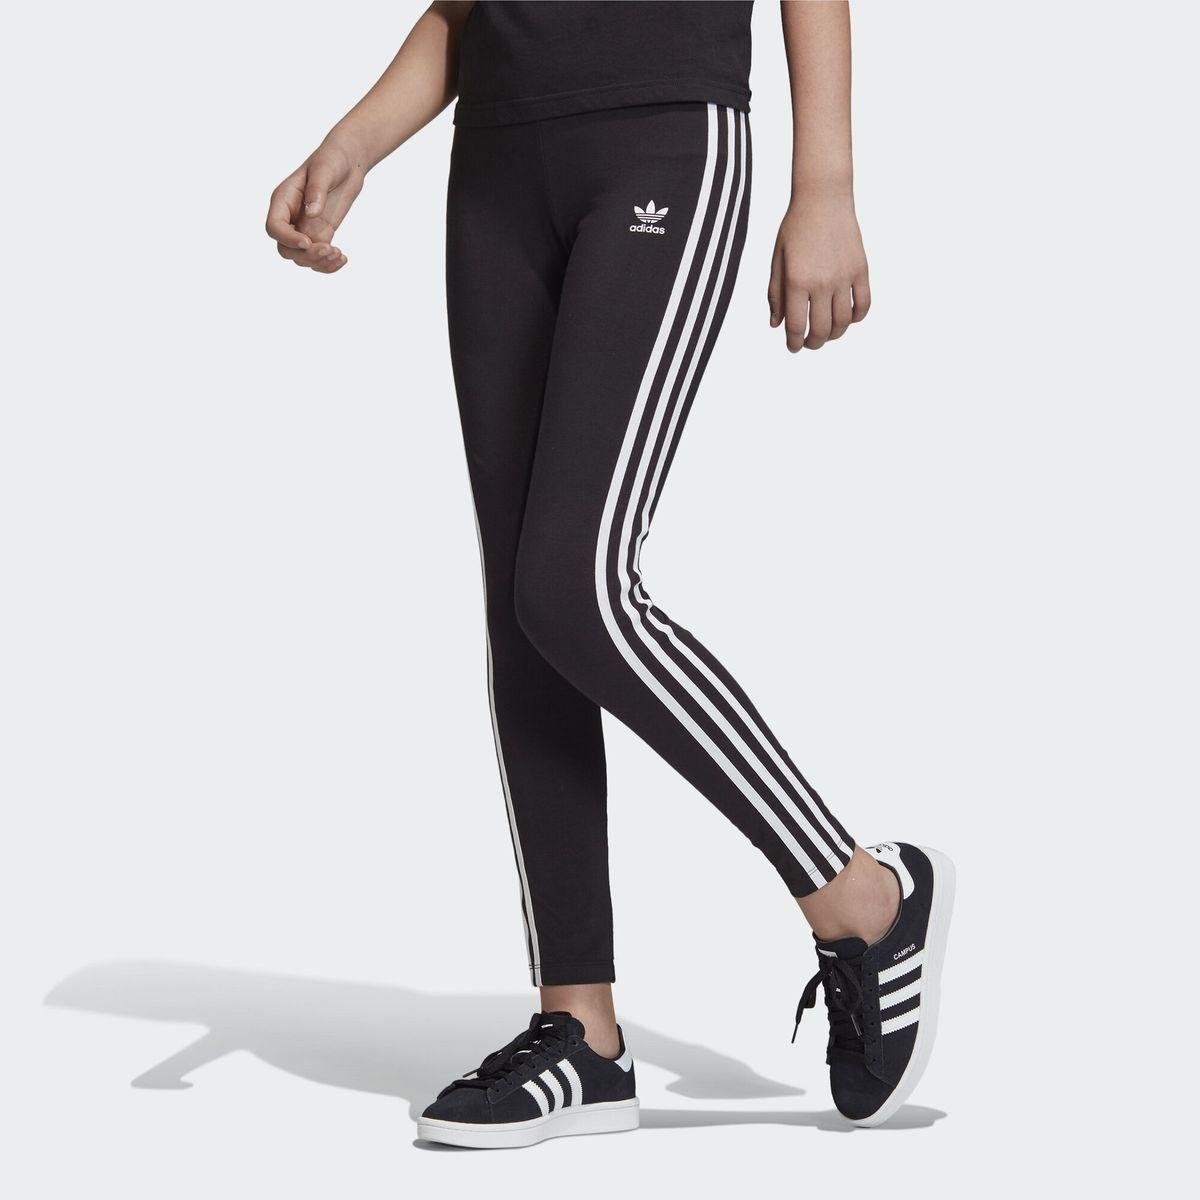 Legging 3 stripes Taille : 1213 ans;89 ans;67 ans